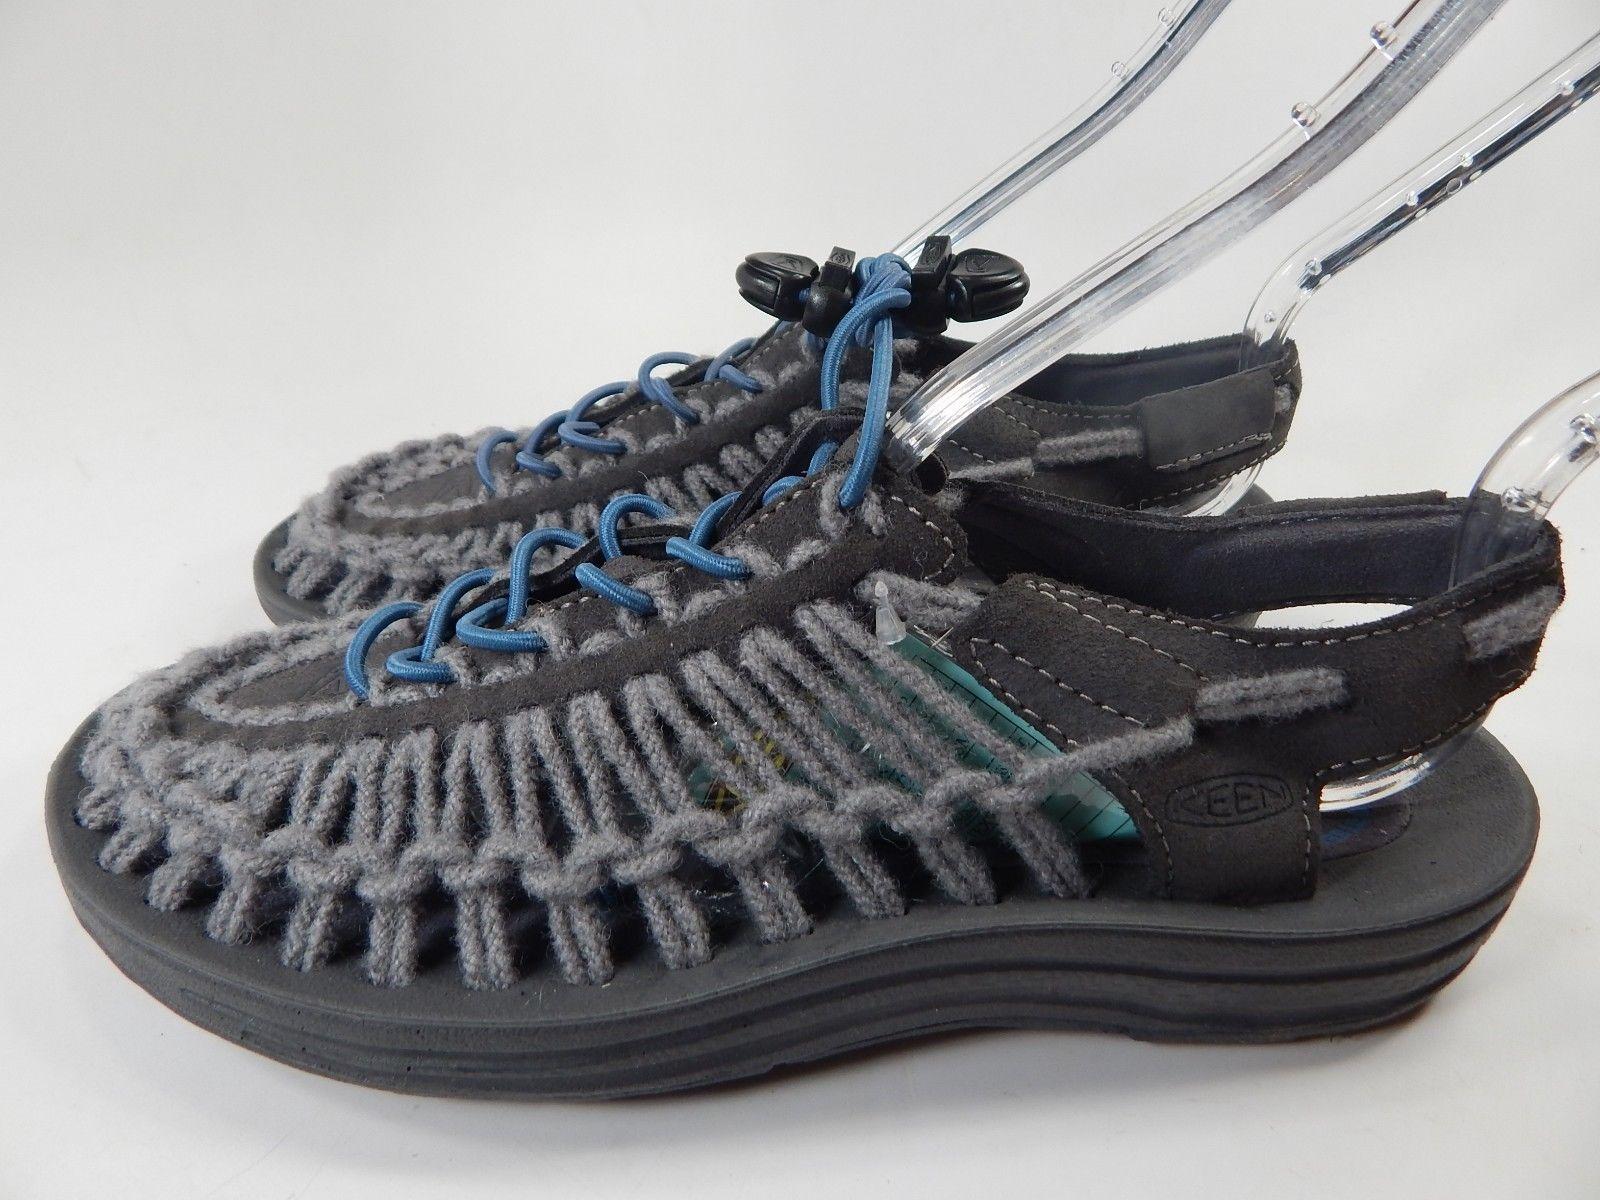 Keen Uneek Leather Women's Sport Sandals Size US 7 M (B) EU 37.5 Magnet / Blue